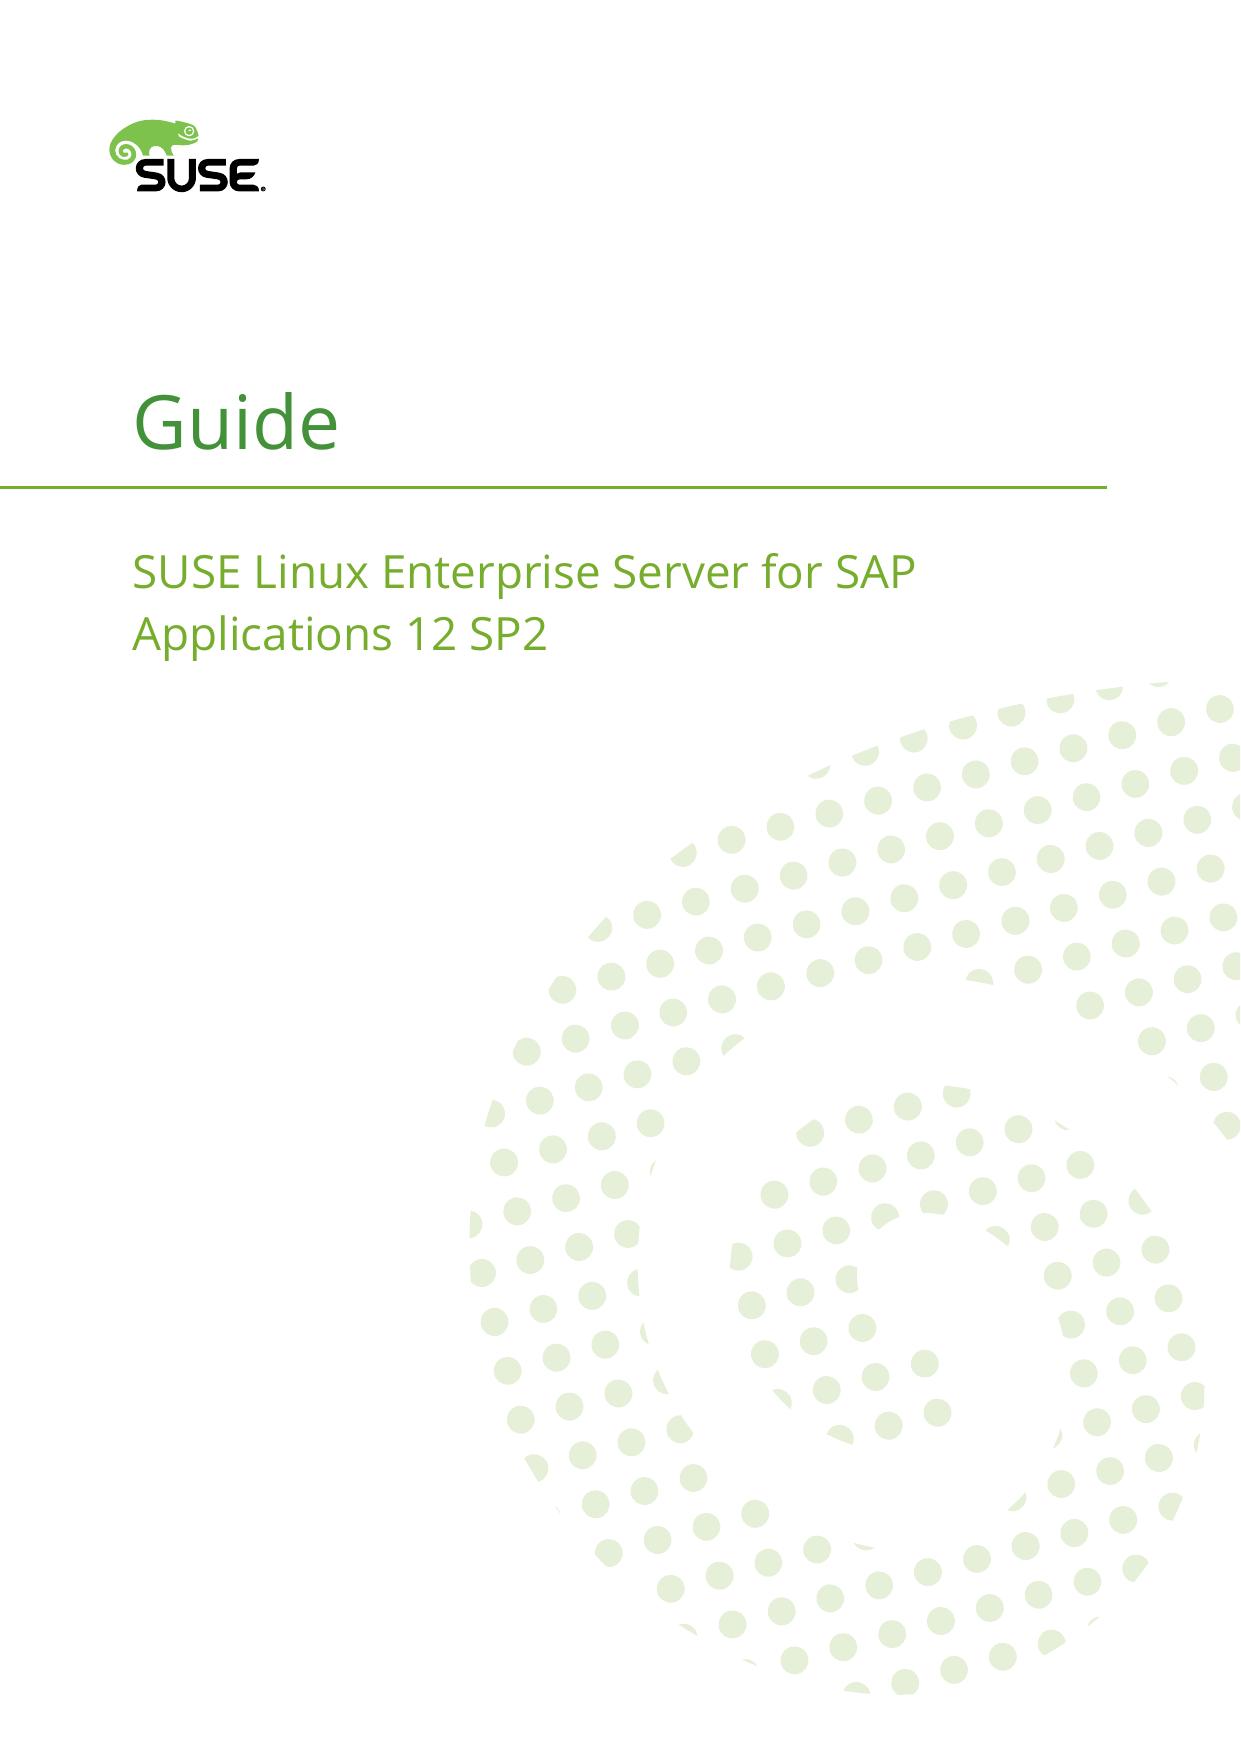 Guide - SUSE Linux Enterprise Server for SAP Applications 12 SP2